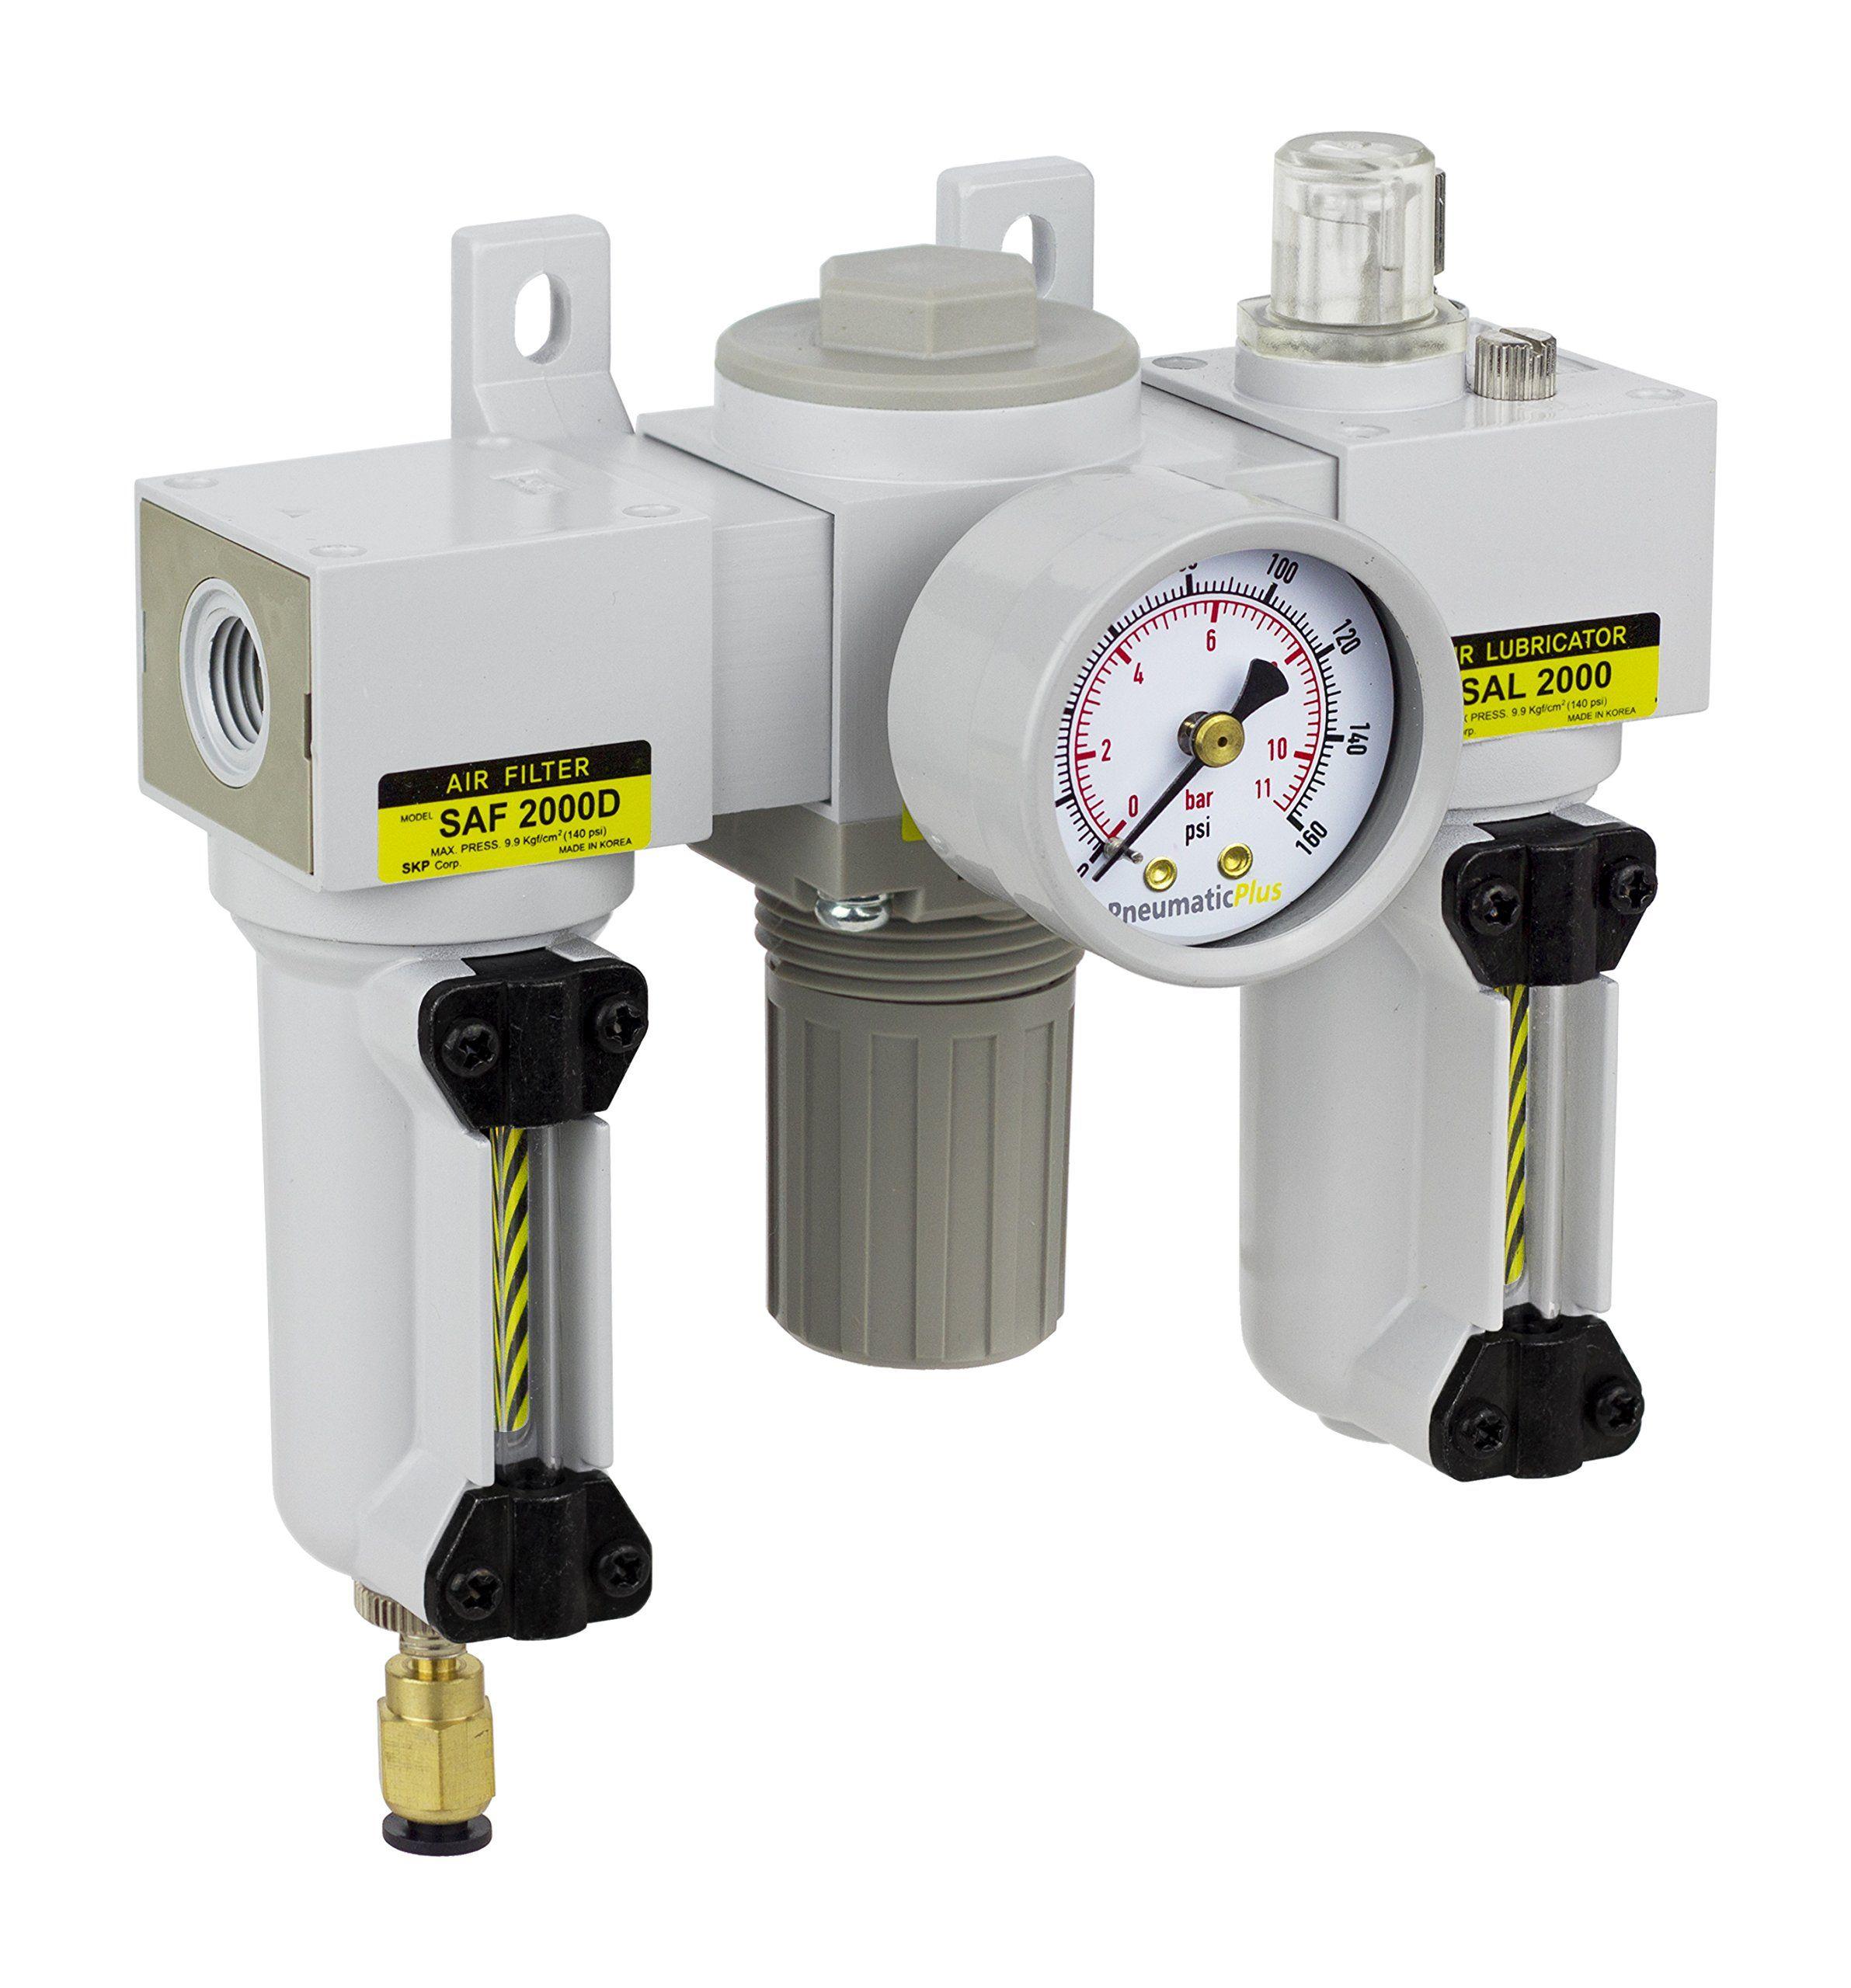 Pneumaticplus Sau2000mn02dgmep Mini Threeunit Combo Compressed Air Filter Regulator Lubricator Frl Air Preparat Air Filter Compressed Air Compressed Air Filter